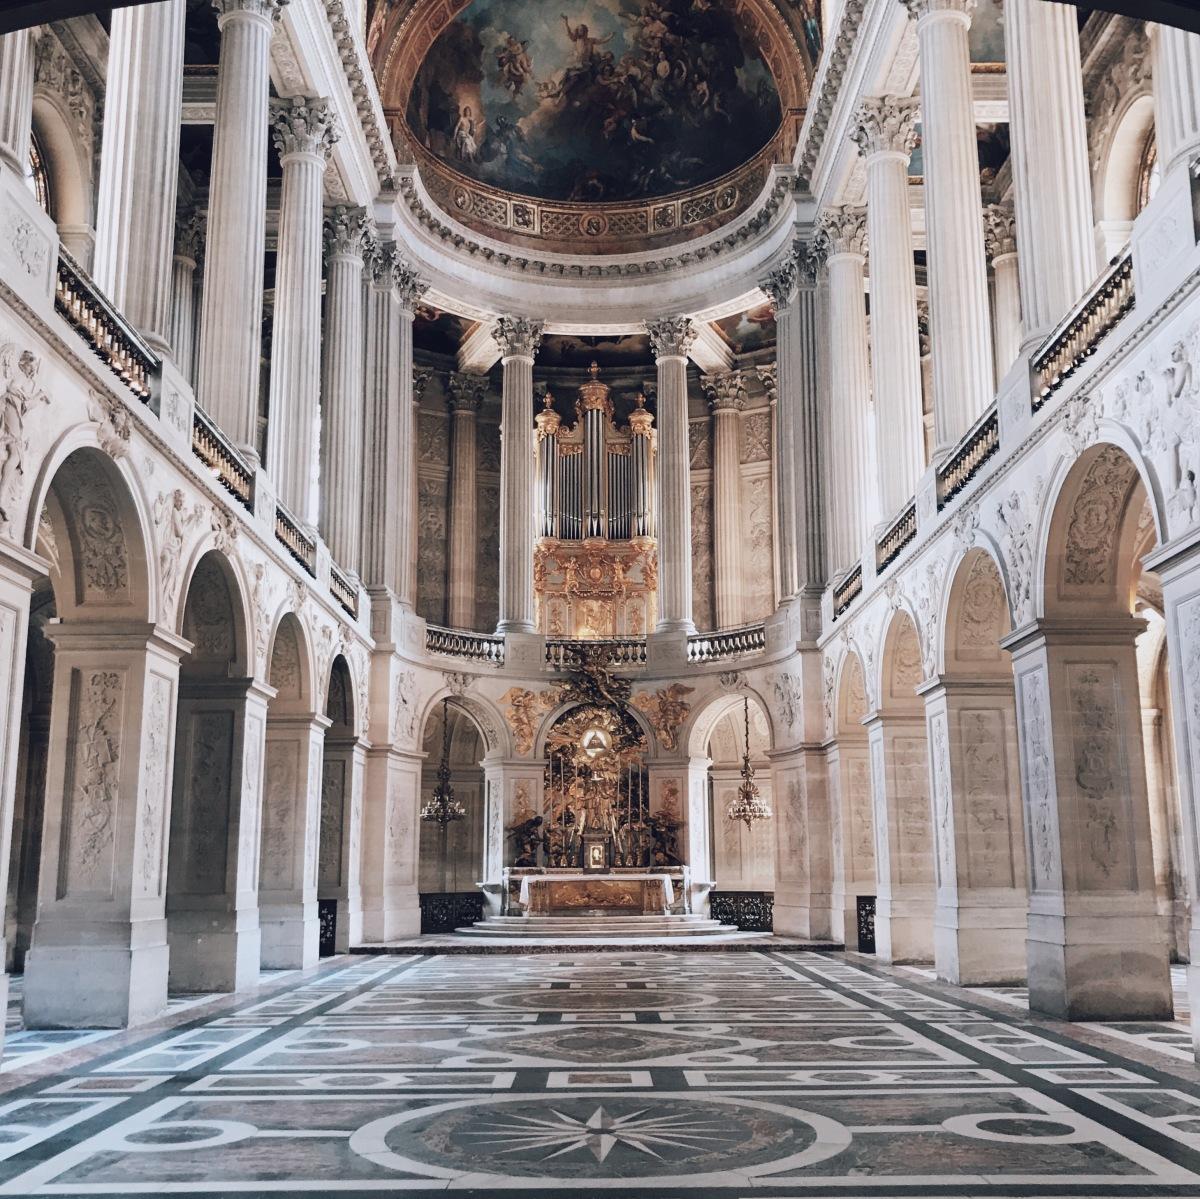 Versailles Sarayı'na Gidiyoruz!